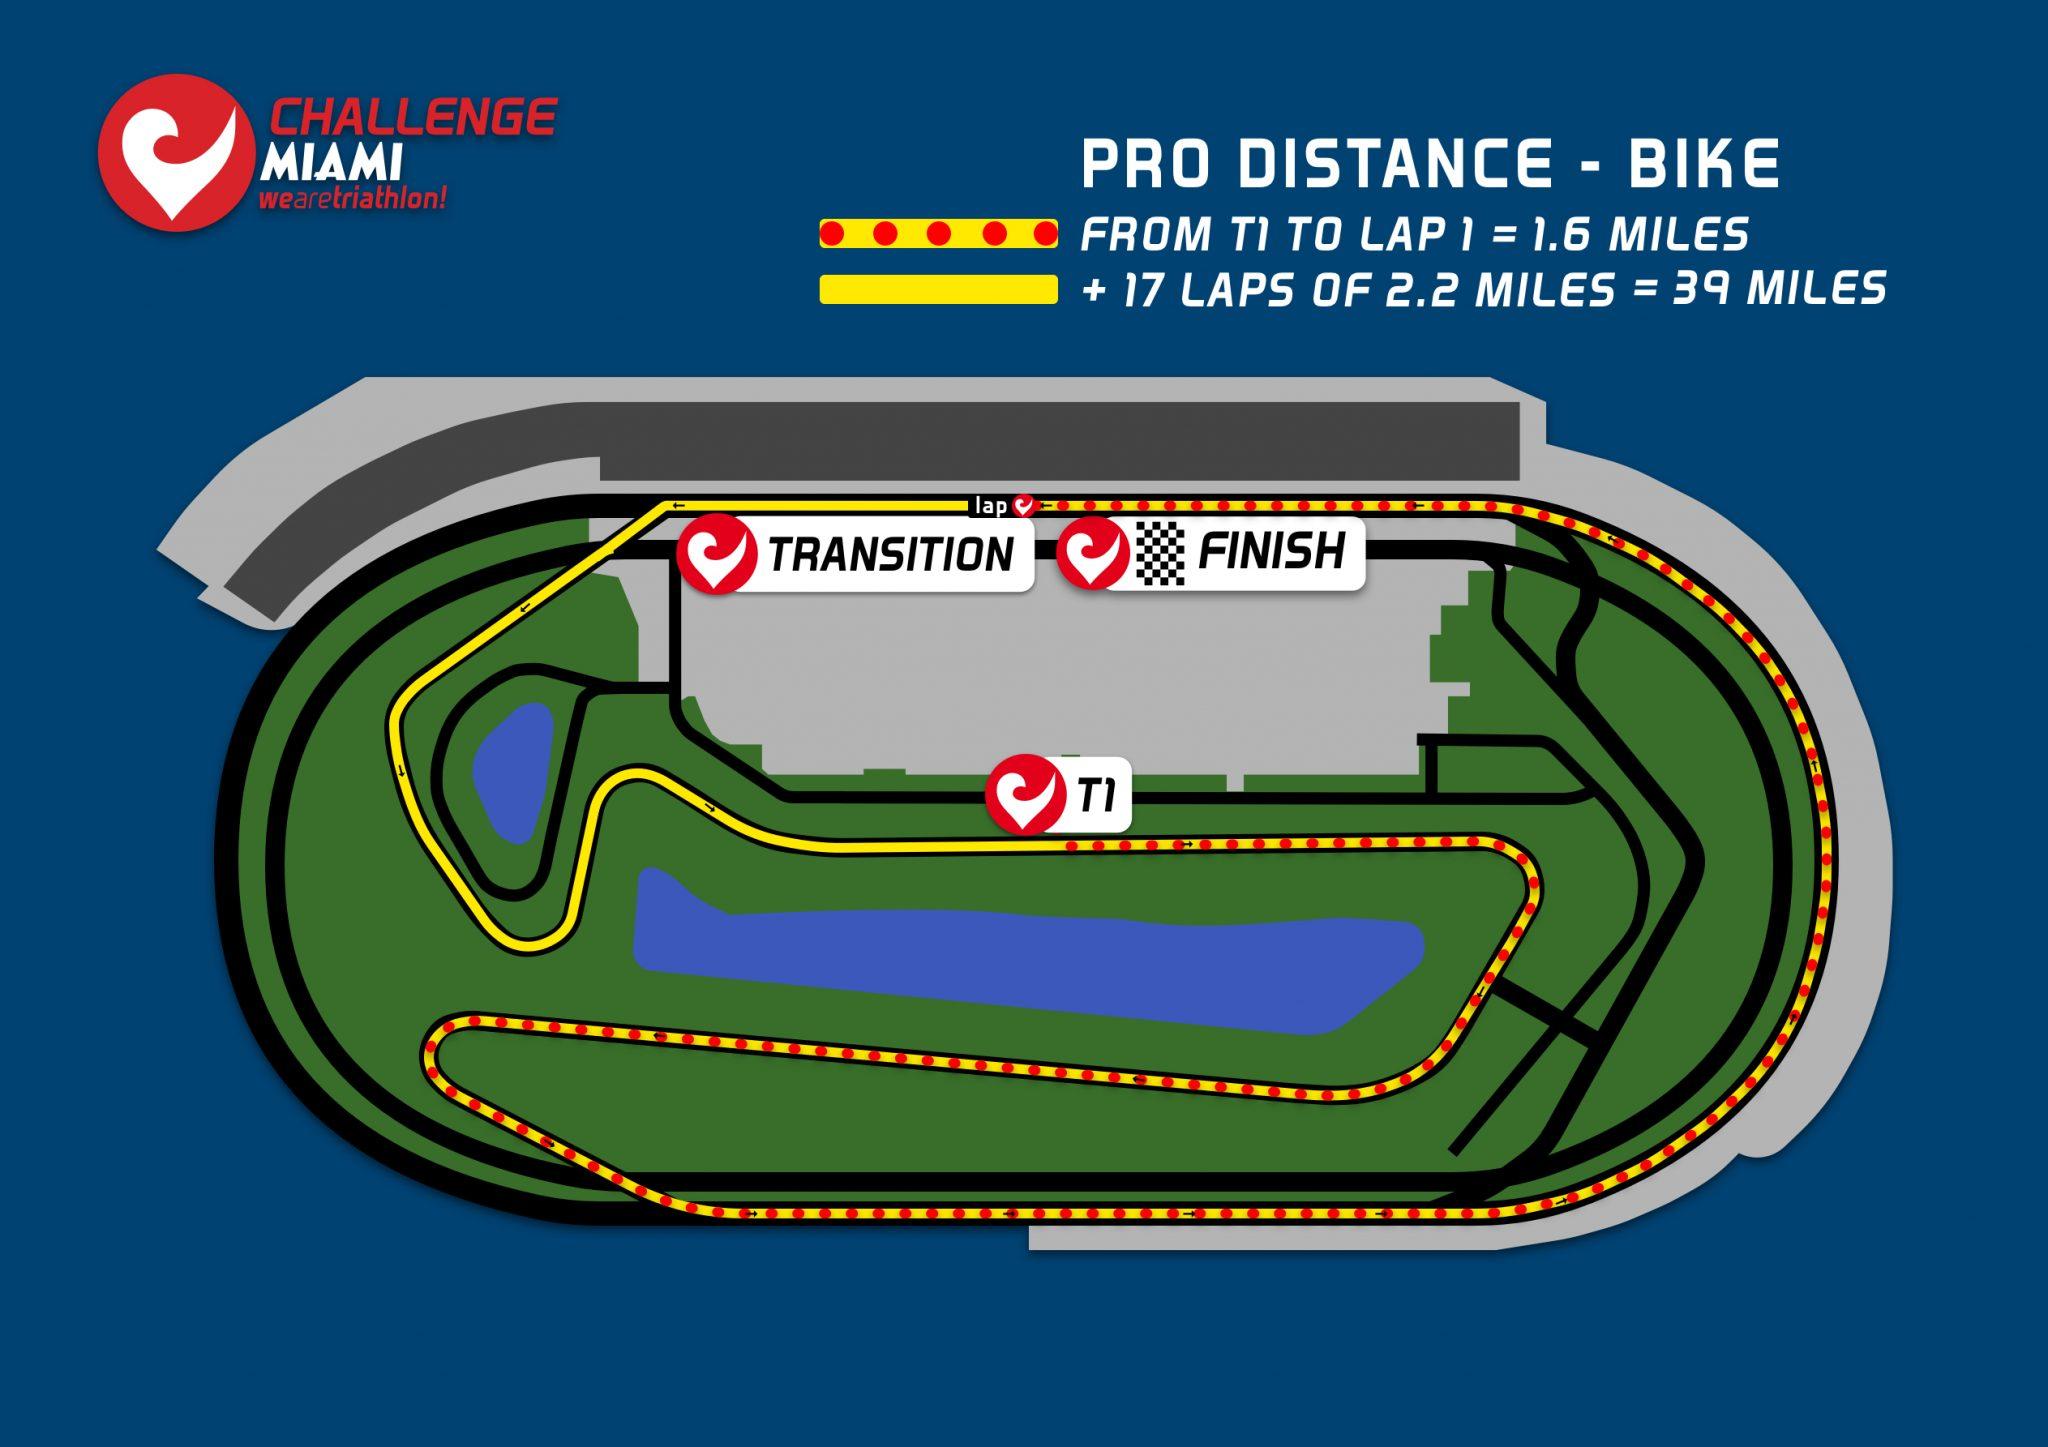 Miami Distance Pro Race